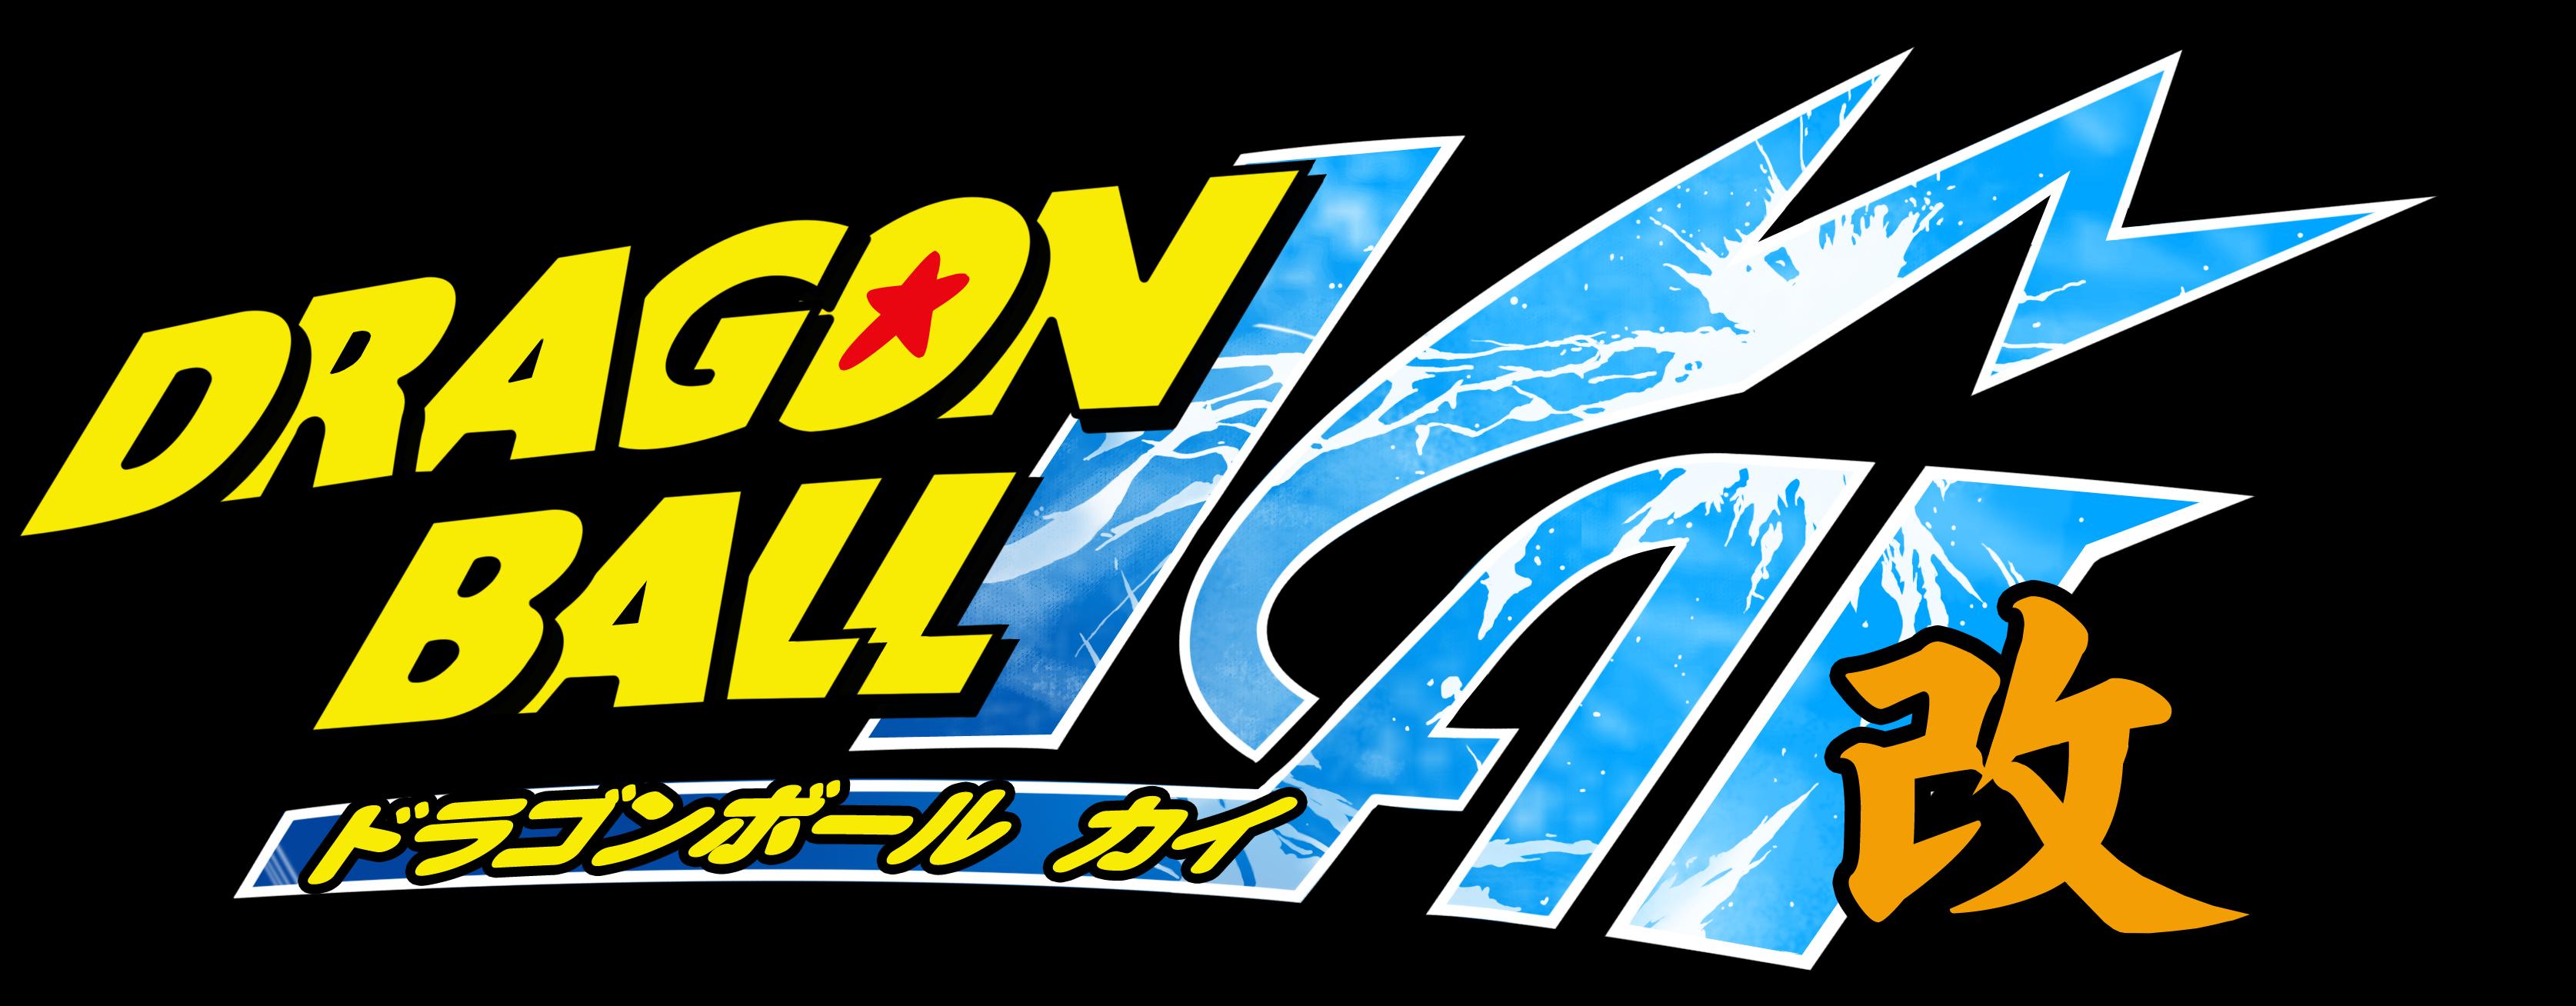 Download Dragon Ball Kai Logo Dragon Ball Z Kai Letras Full